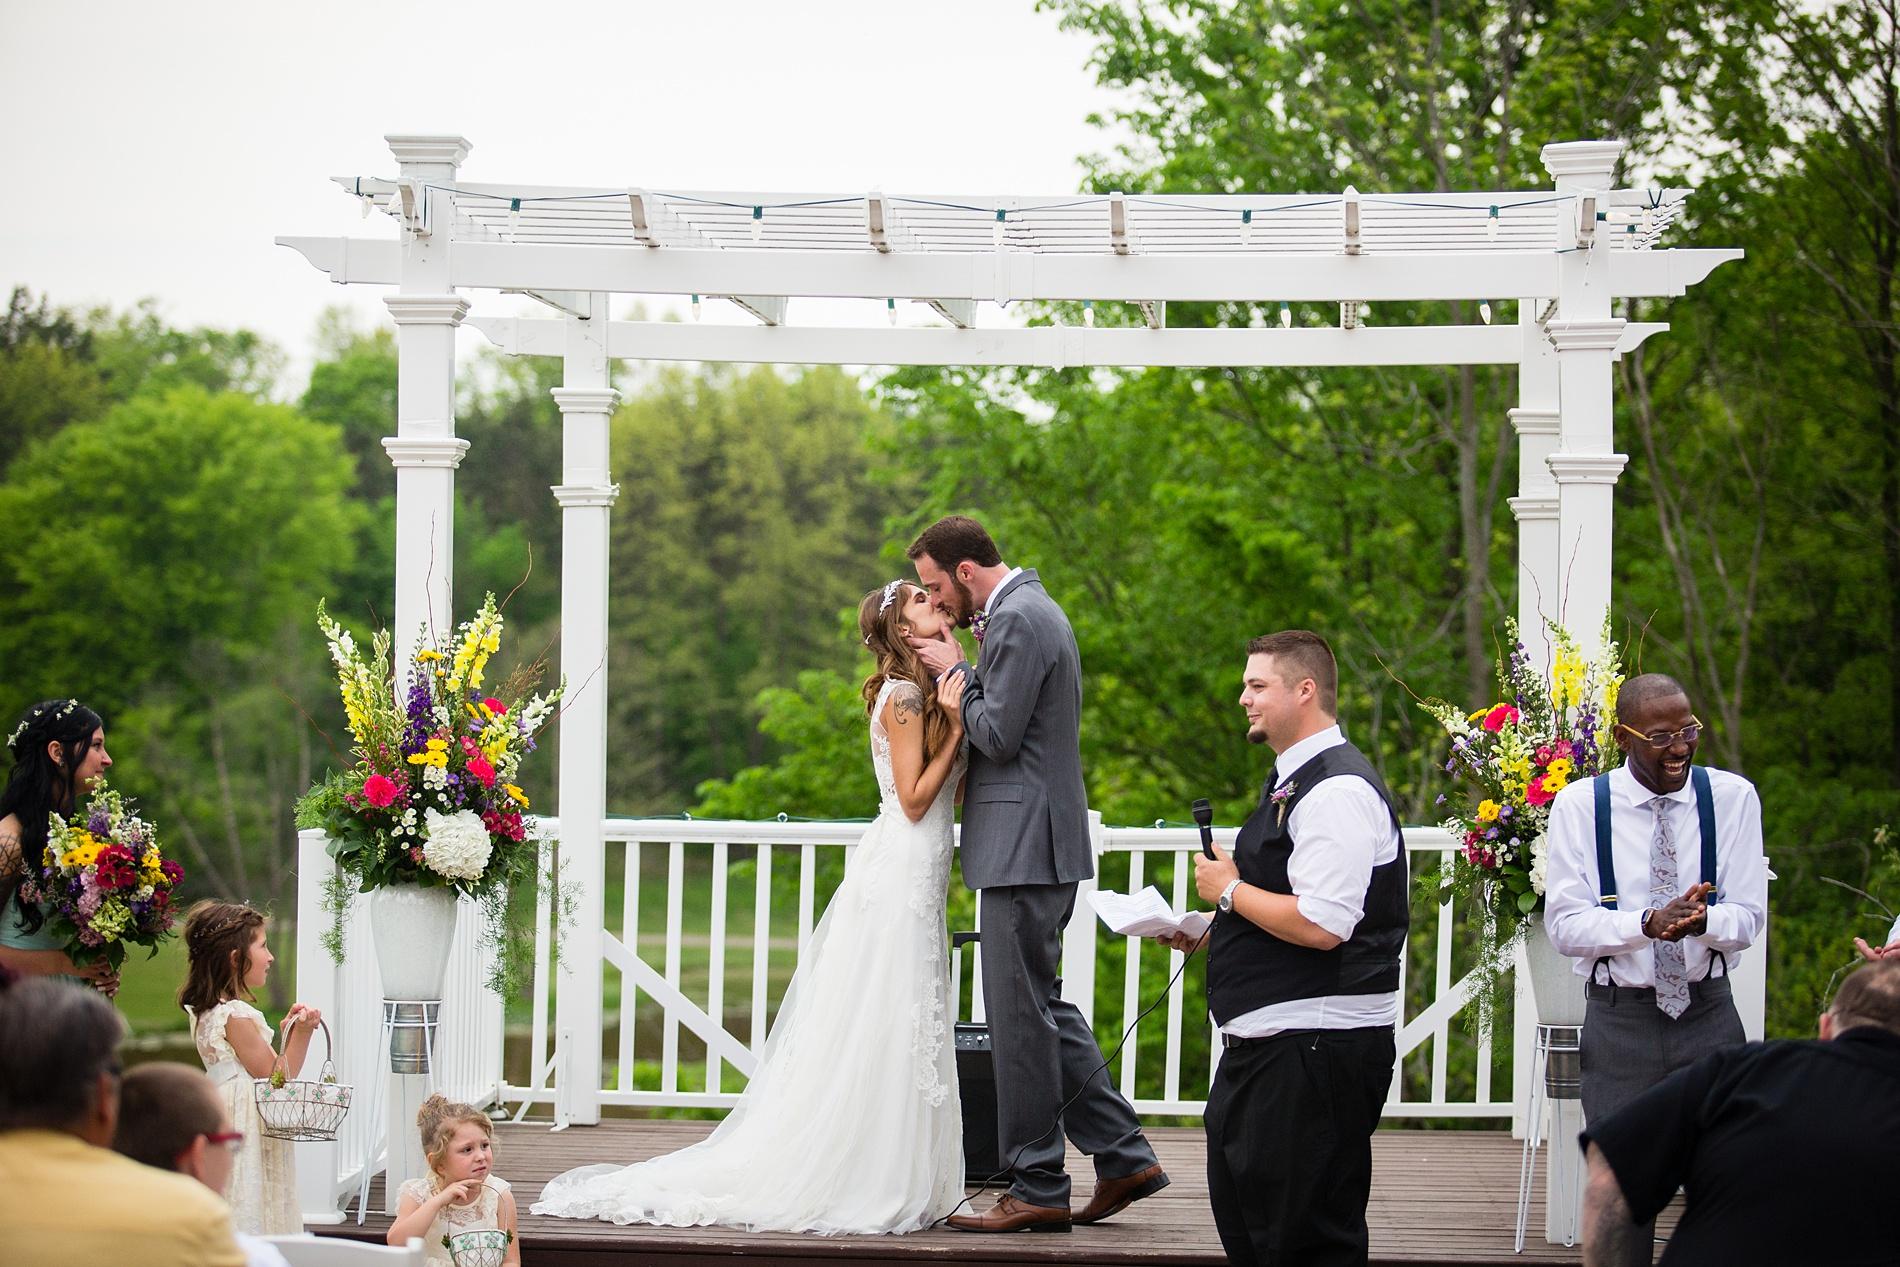 Brandon_Shafer_Photography_Brett_Autumn_Wedding_0043.jpg